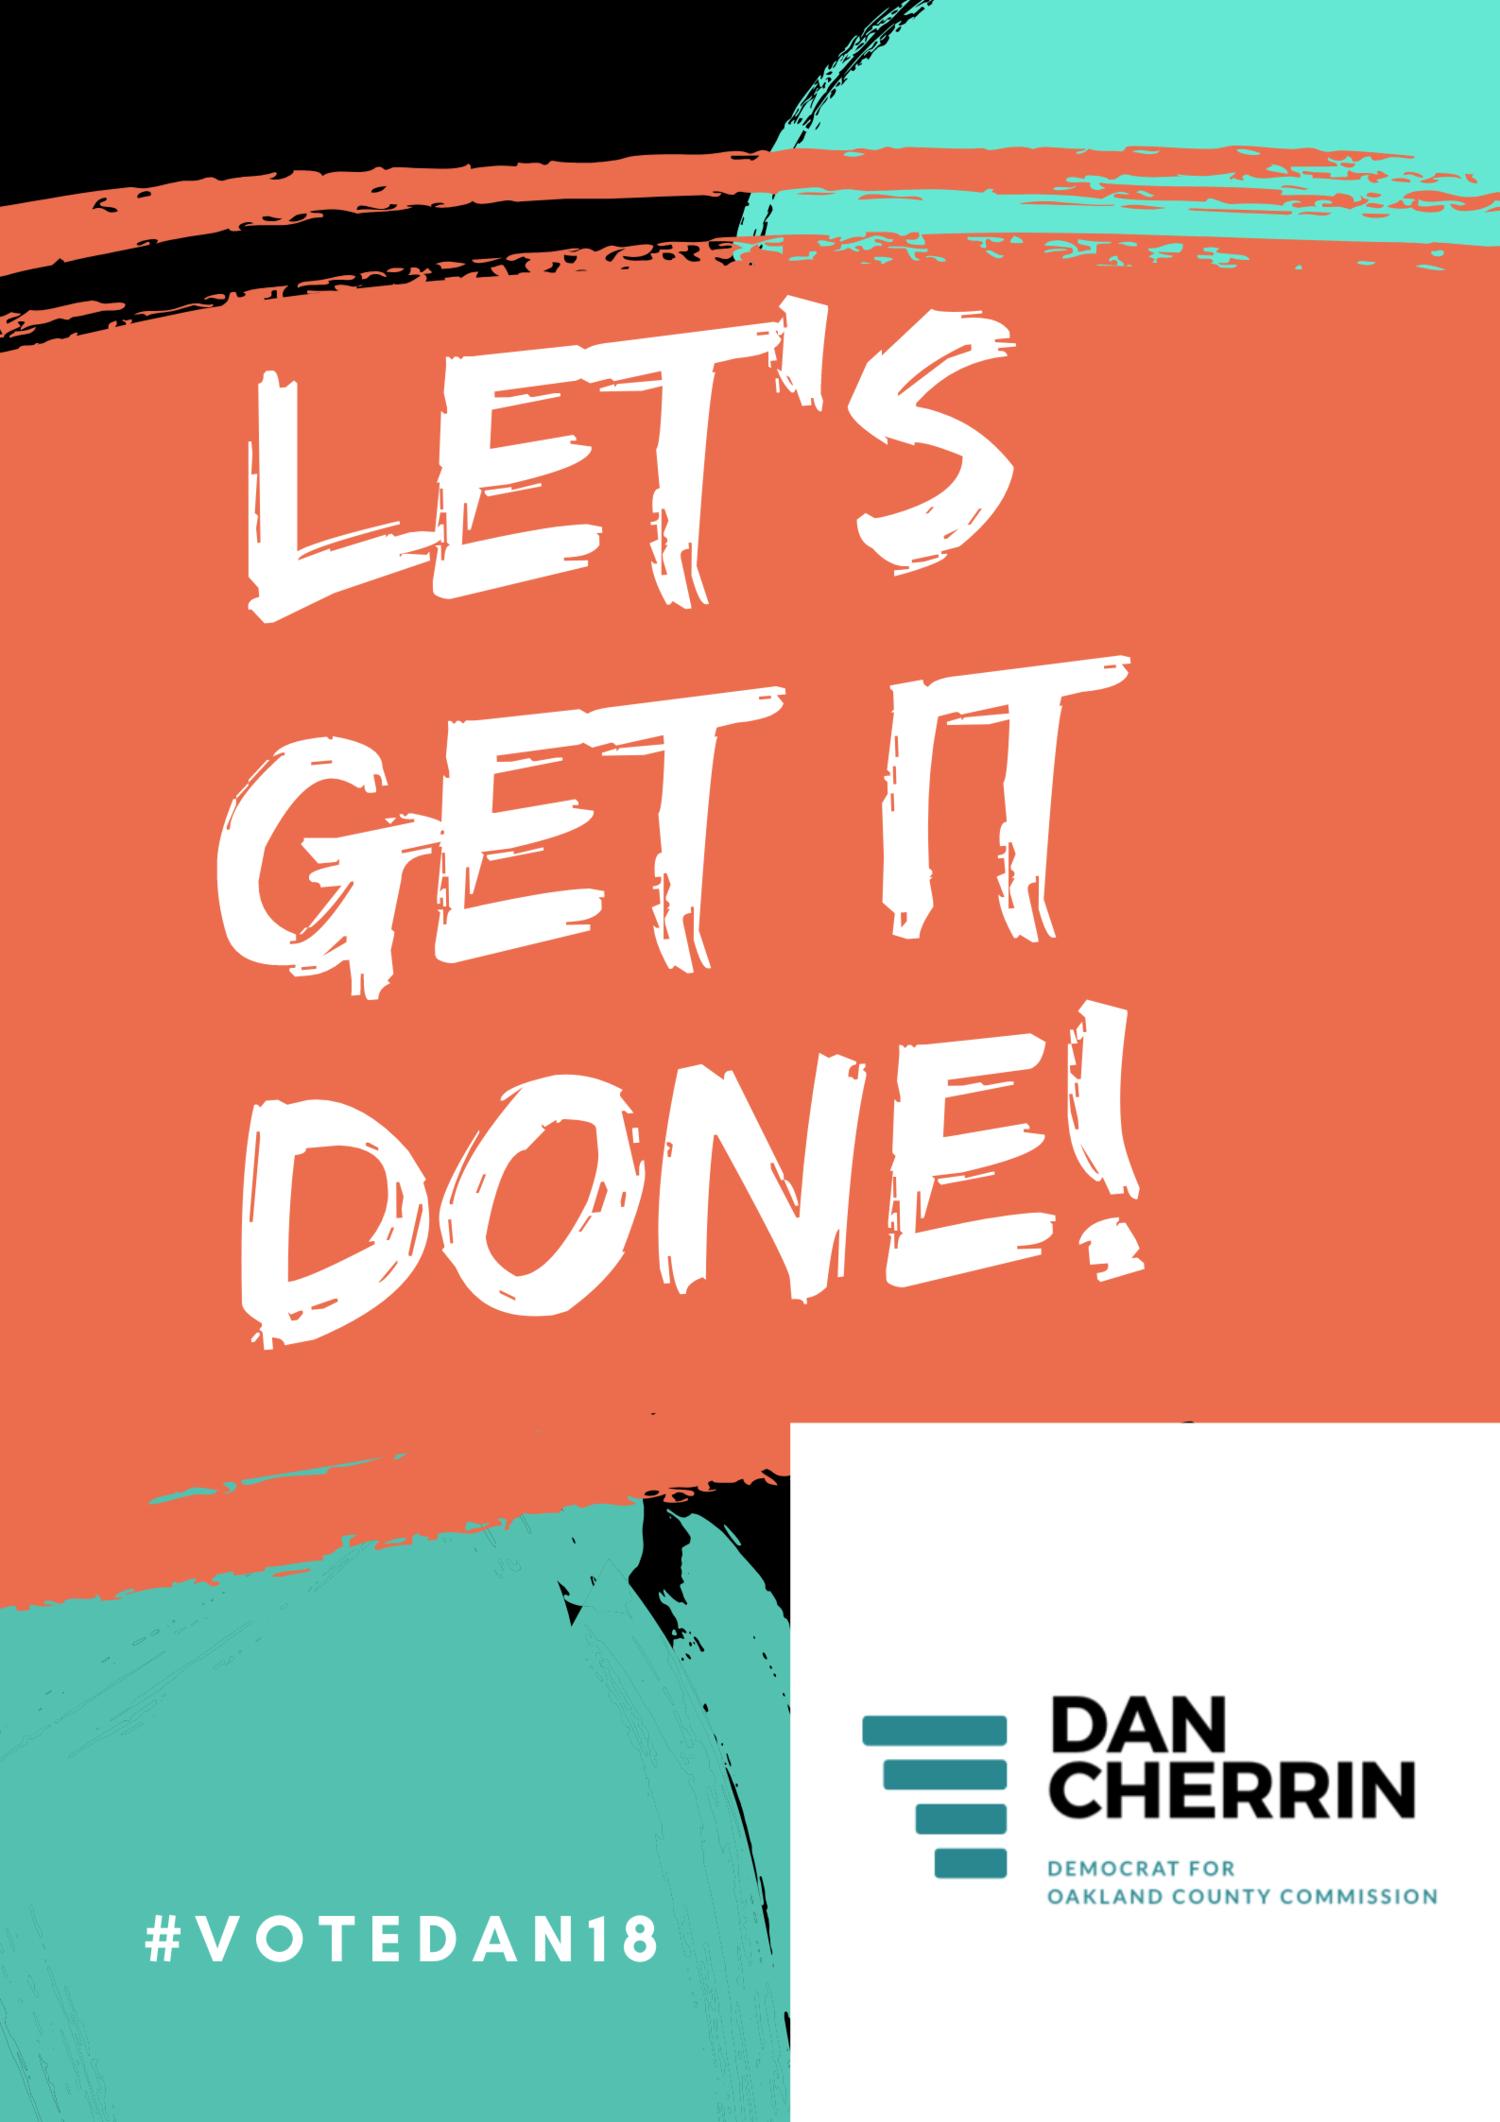 @dancherrin's cover photo for 'The South End — Vote for Dan Cherrin'